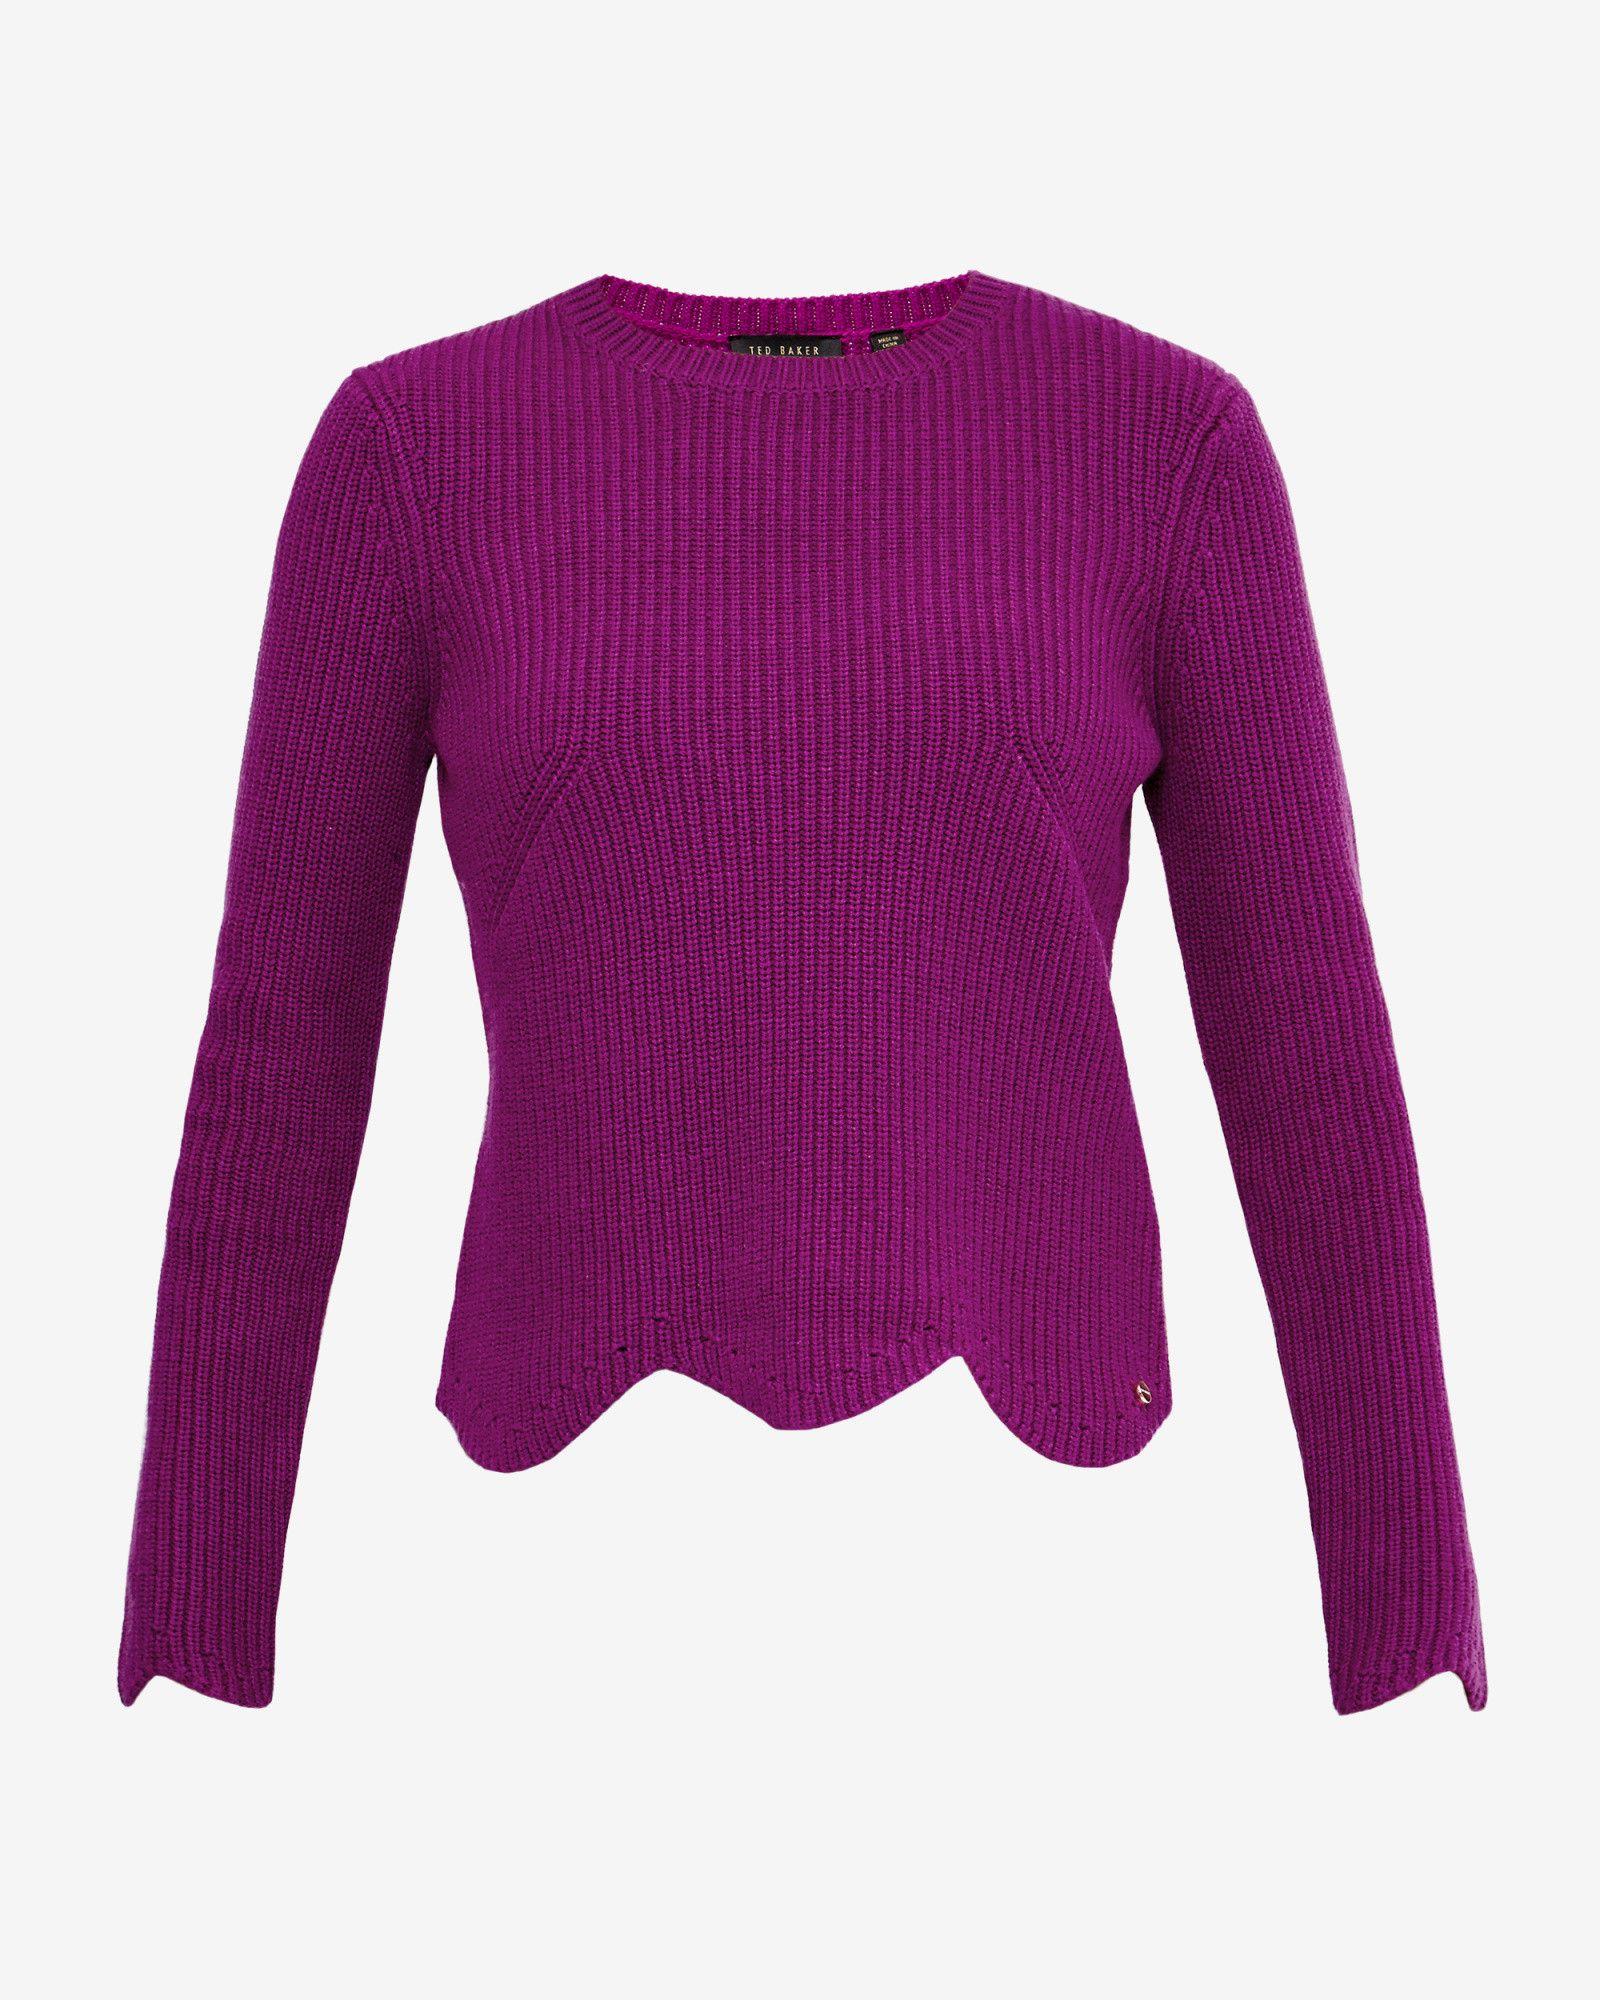 c0422a9d0b9ce Scalloped edge ribbed sweater - Deep Purple